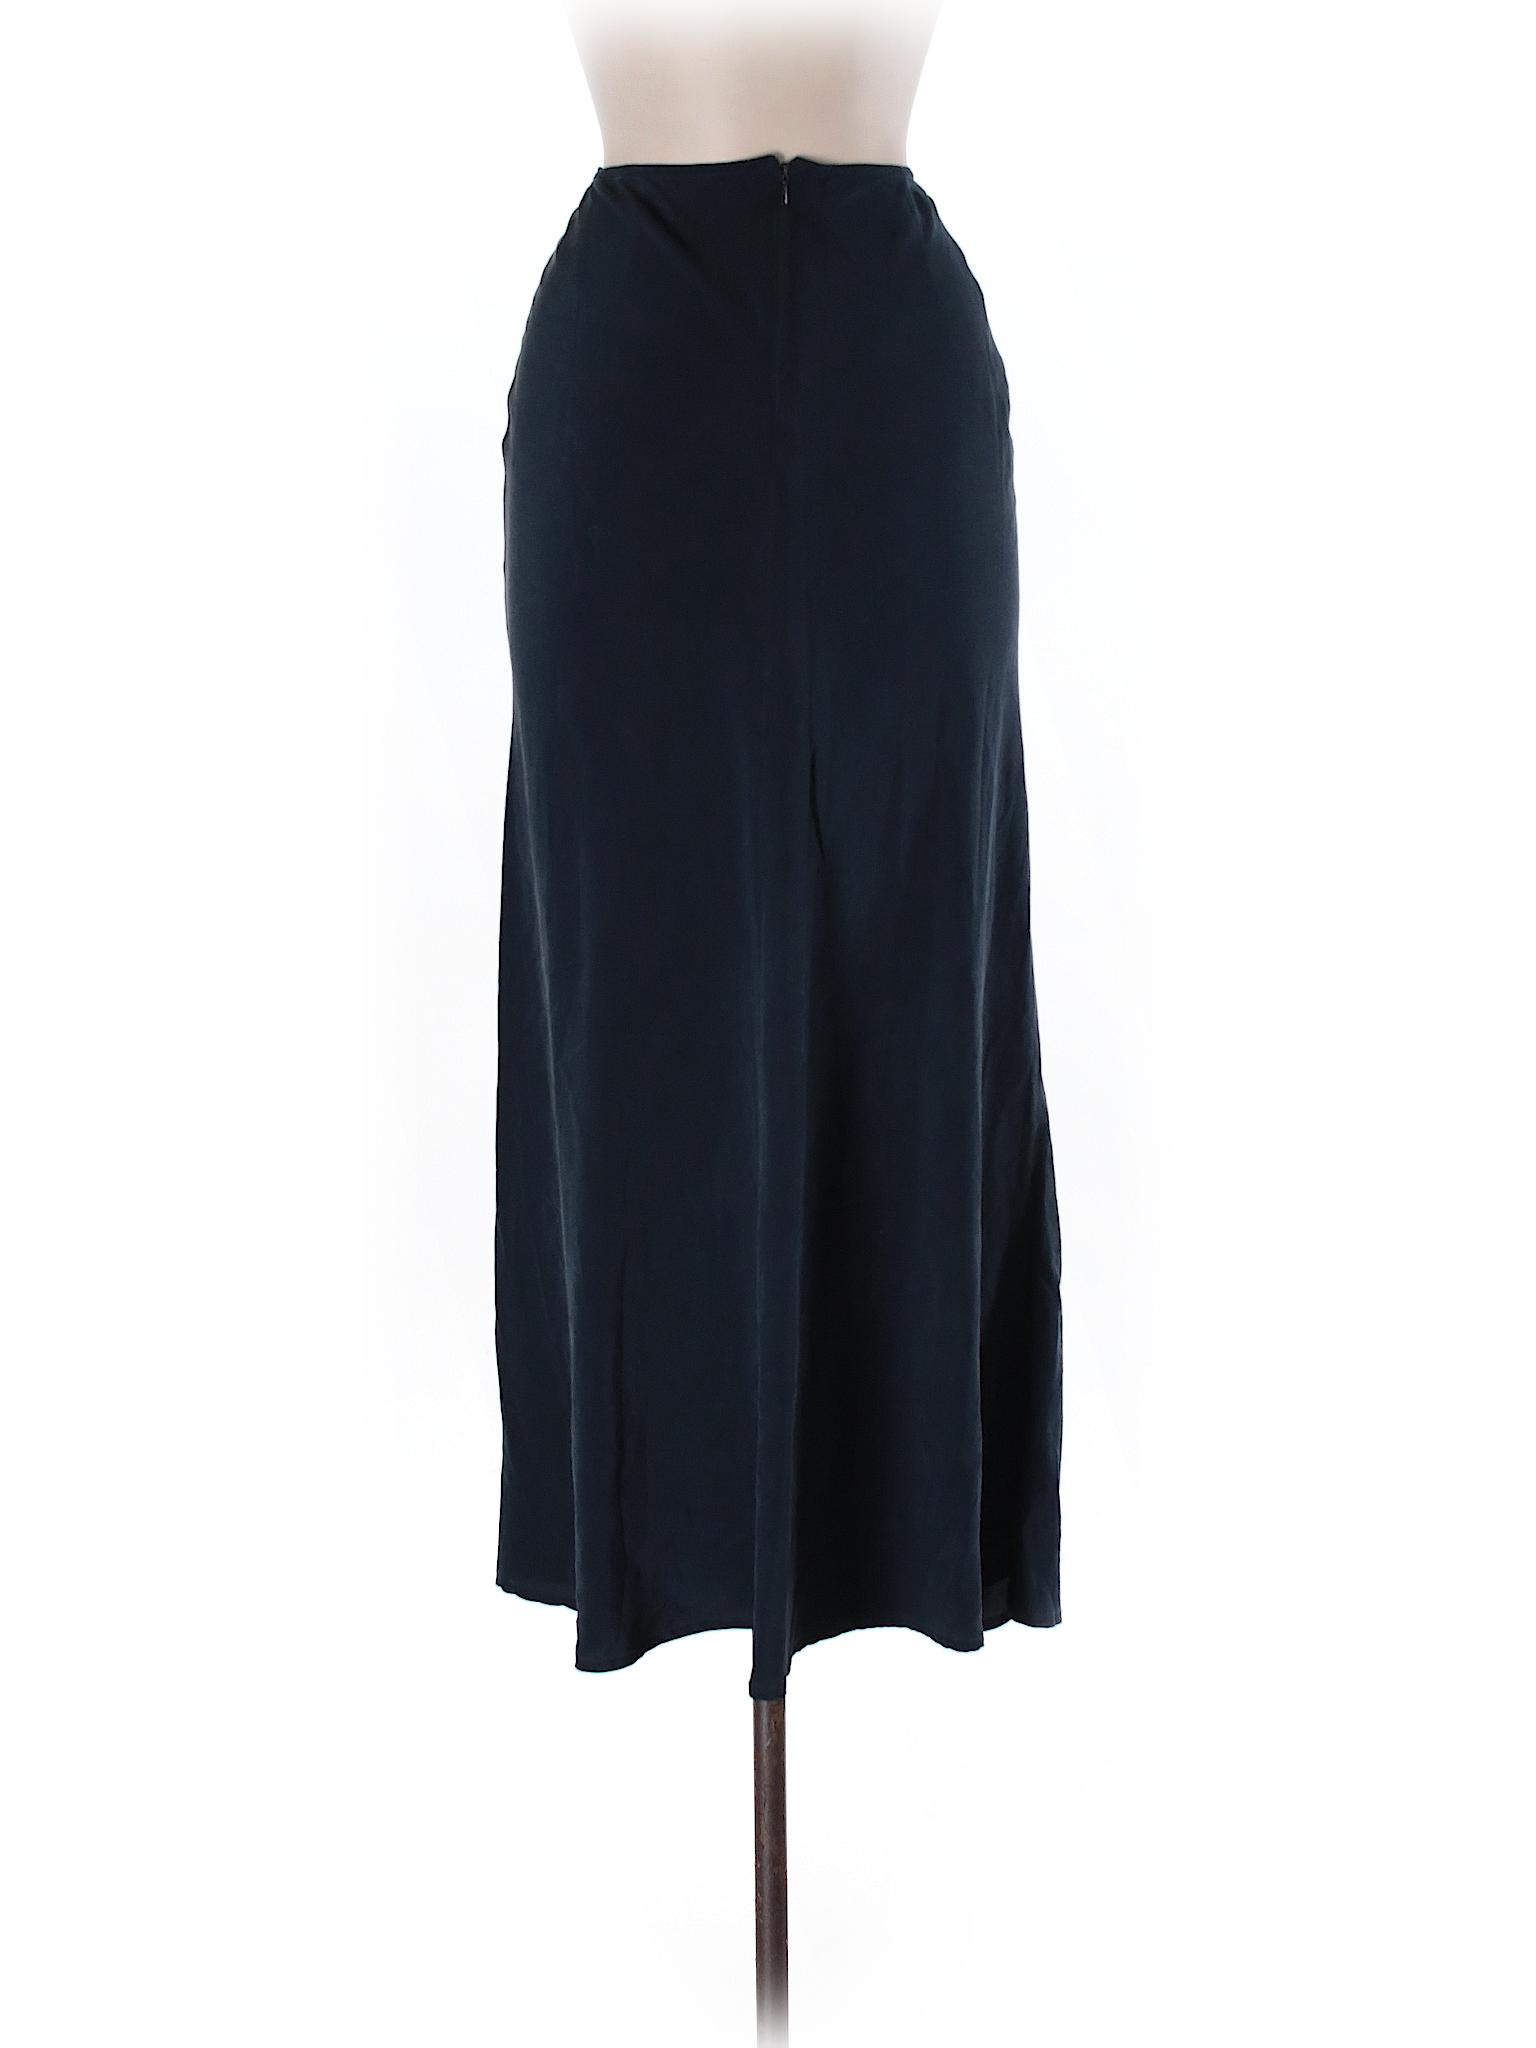 Boutique Skirt Skirt Skirt Skirt Boutique Skirt Silk Silk Silk Boutique Silk Silk Boutique Boutique Boutique Silk qvqCA0w